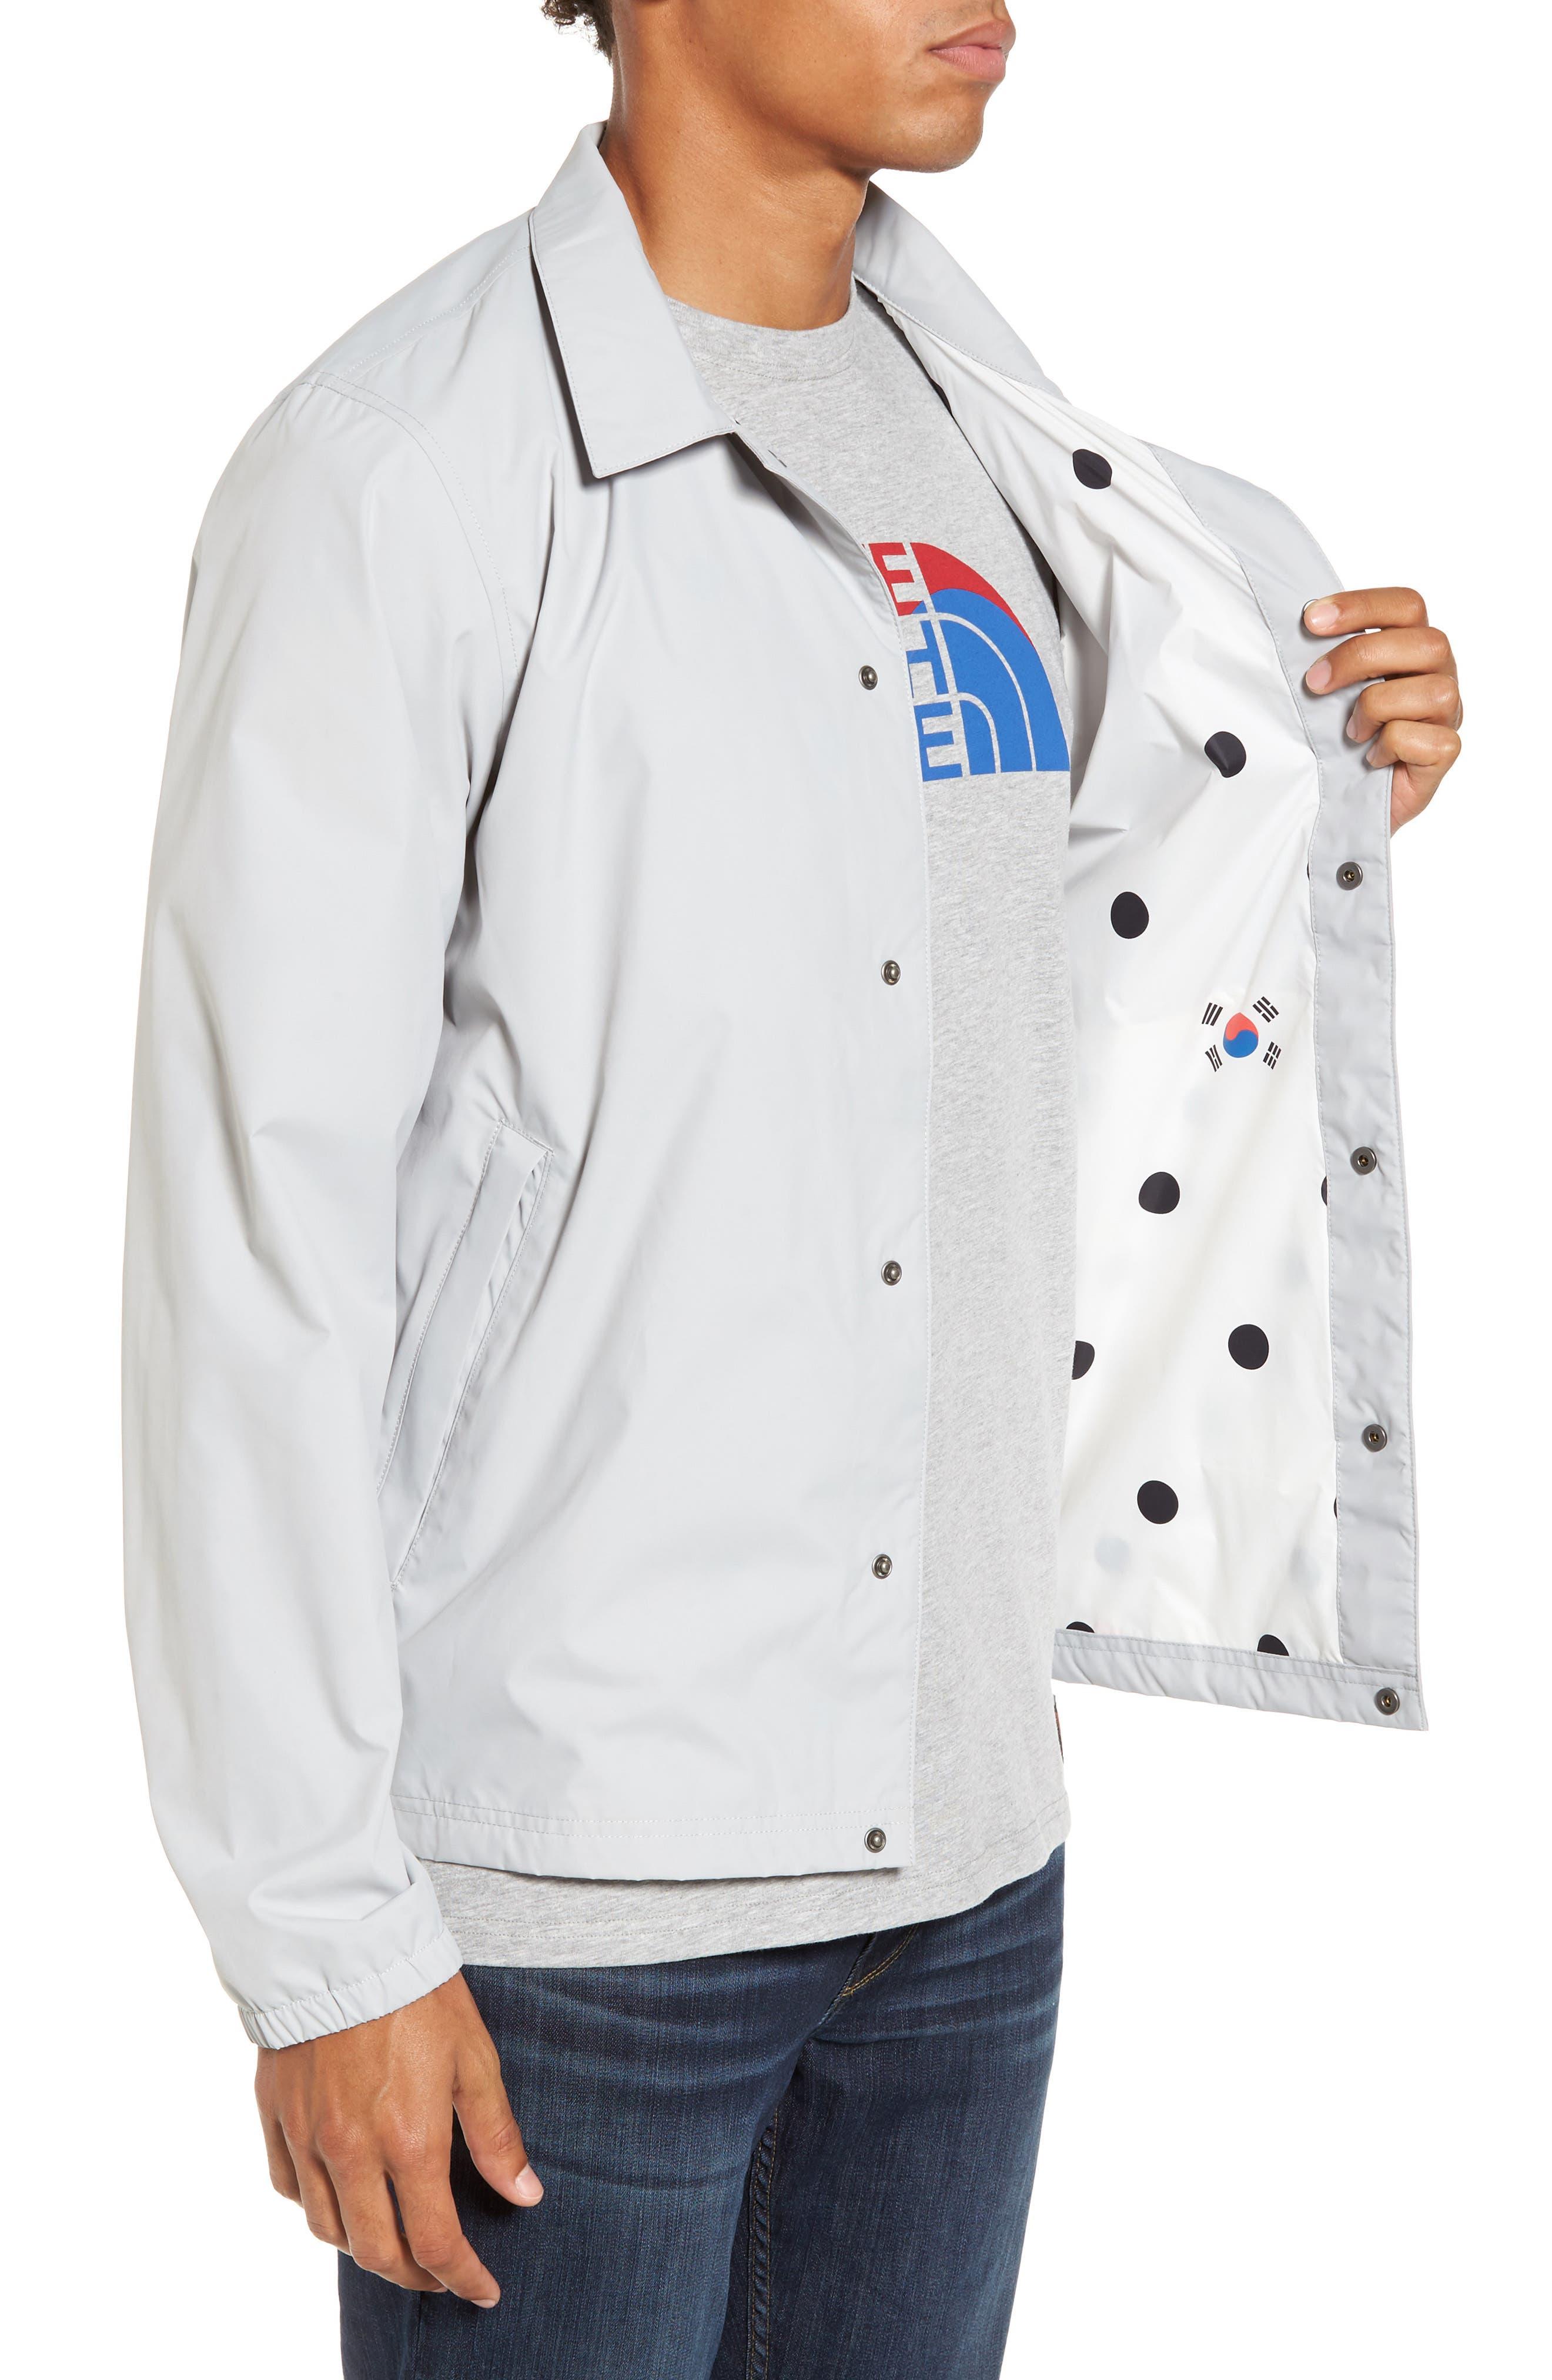 International Collection Coach Jacket,                             Alternate thumbnail 8, color,